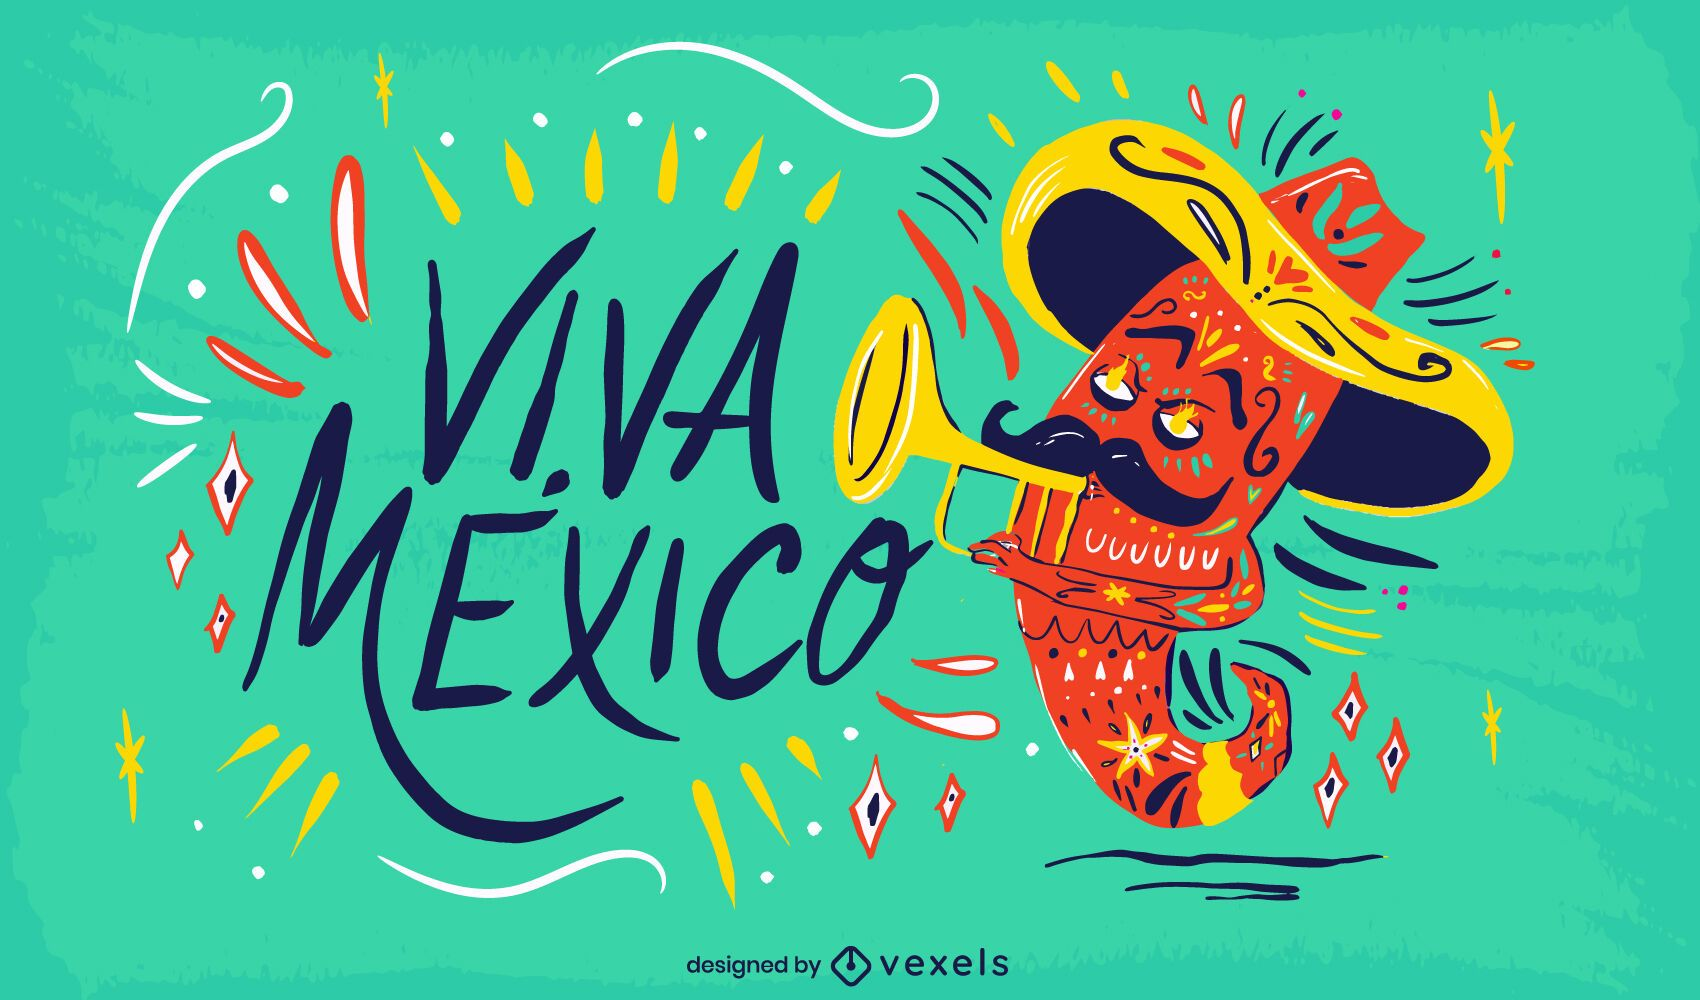 Viva mexico illustration design